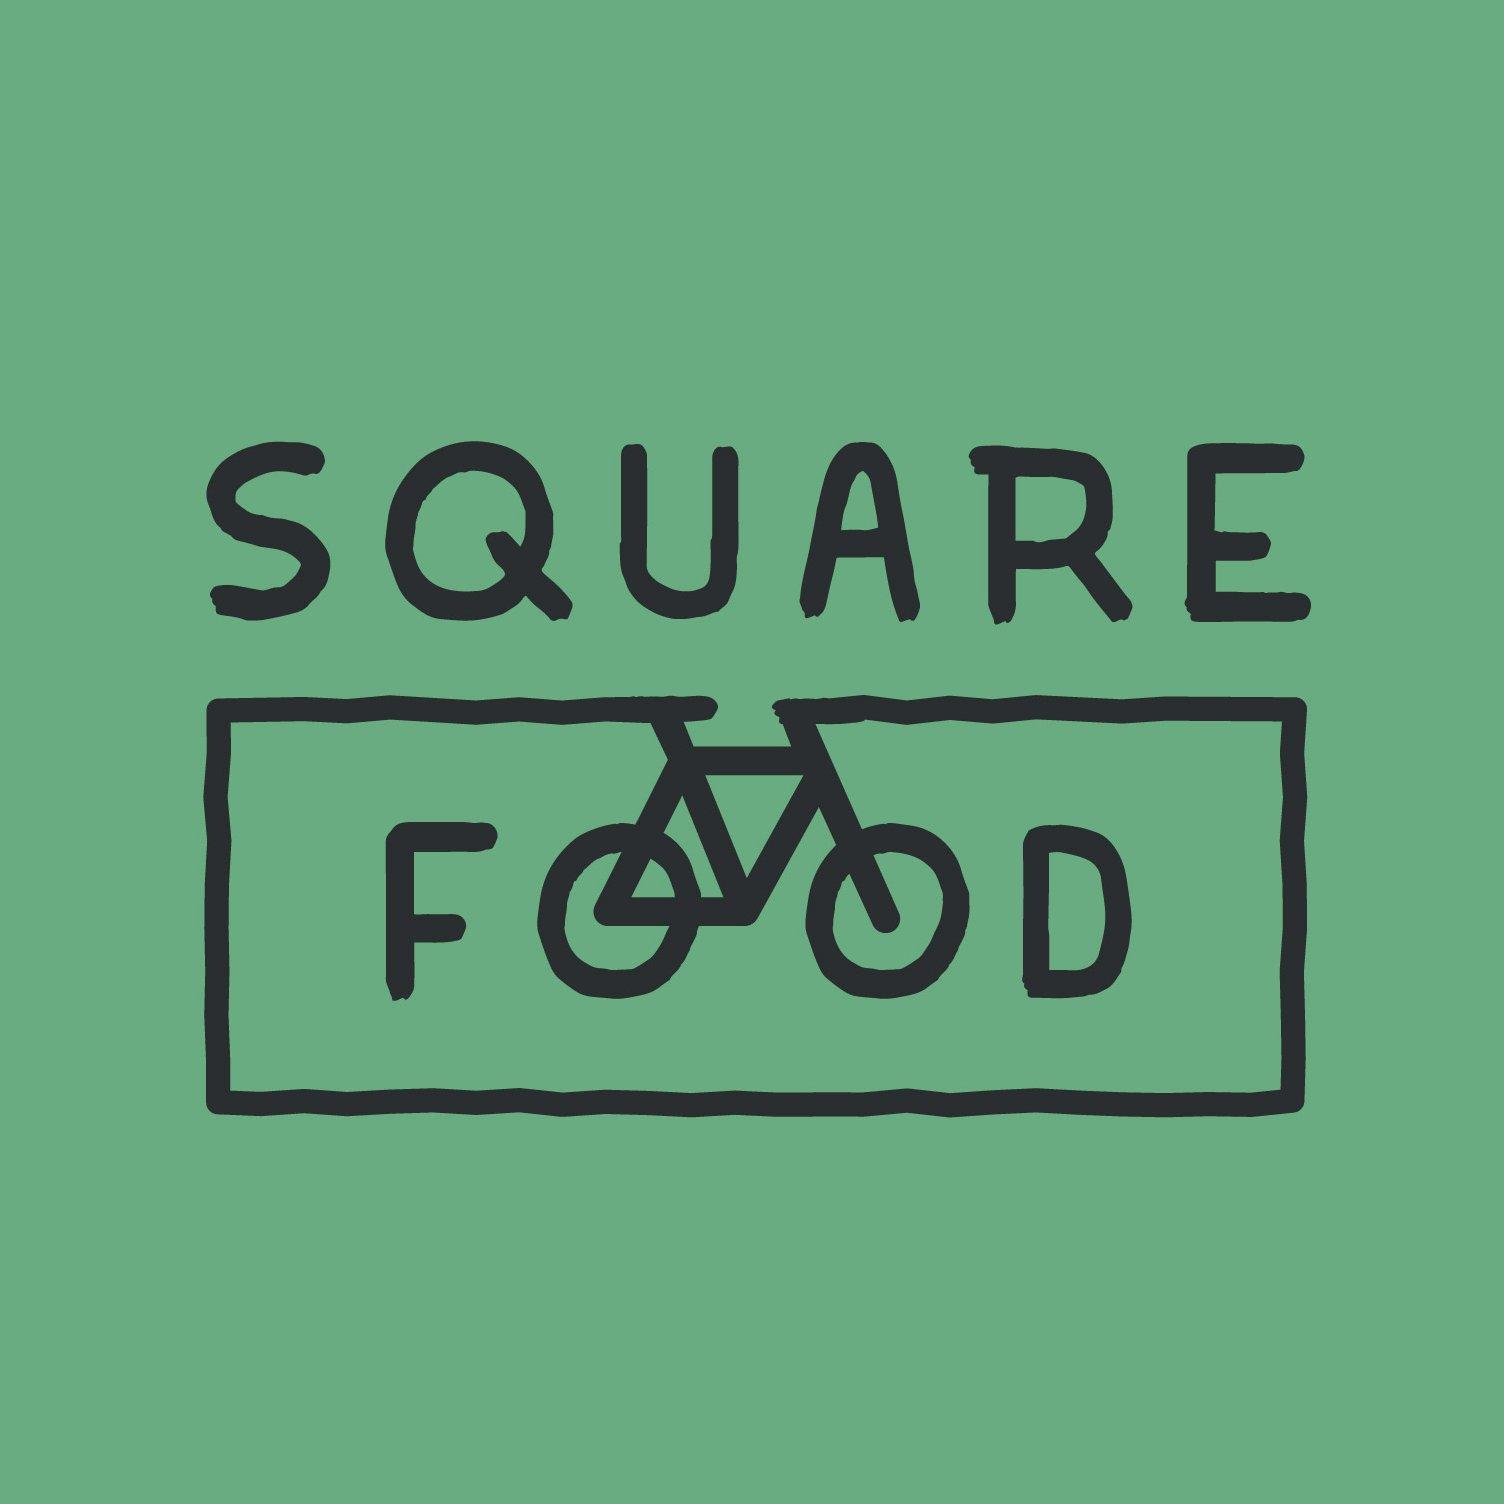 @Squarefood_it